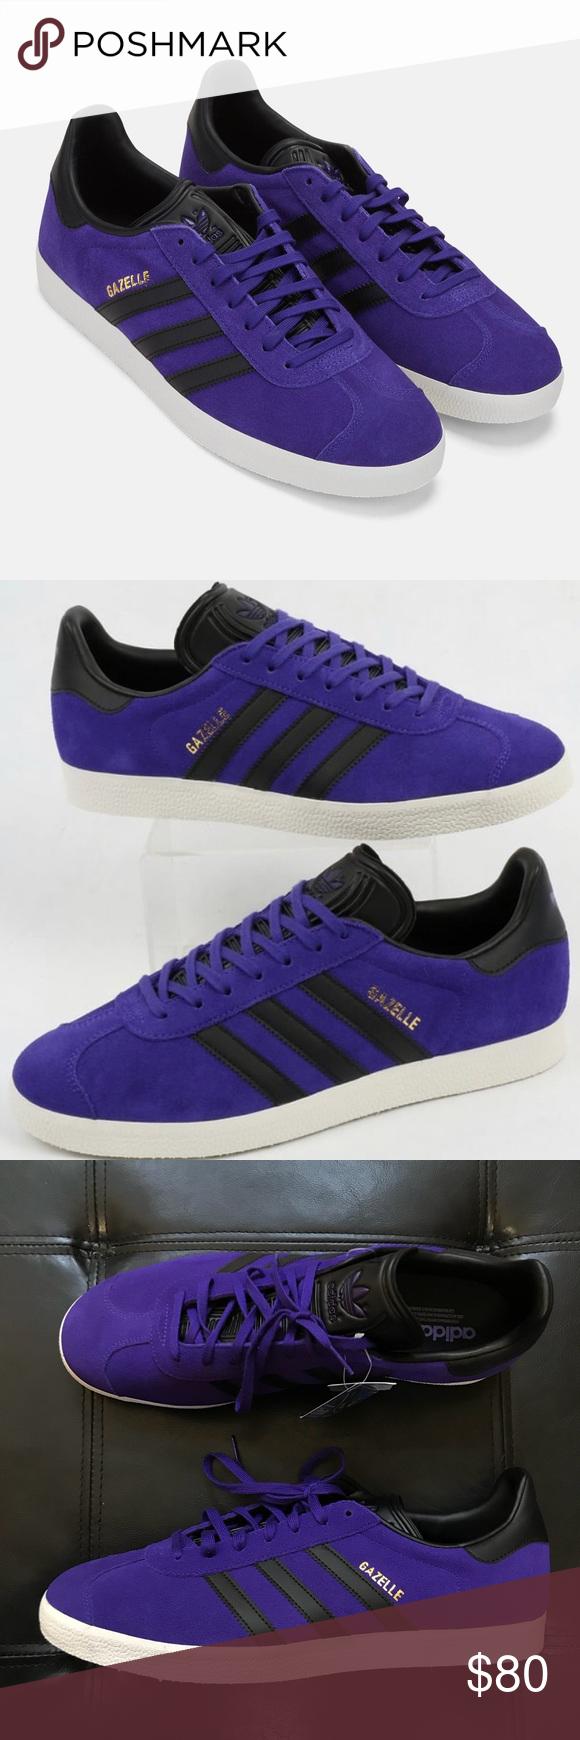 Purple suede, Adidas gazelle black